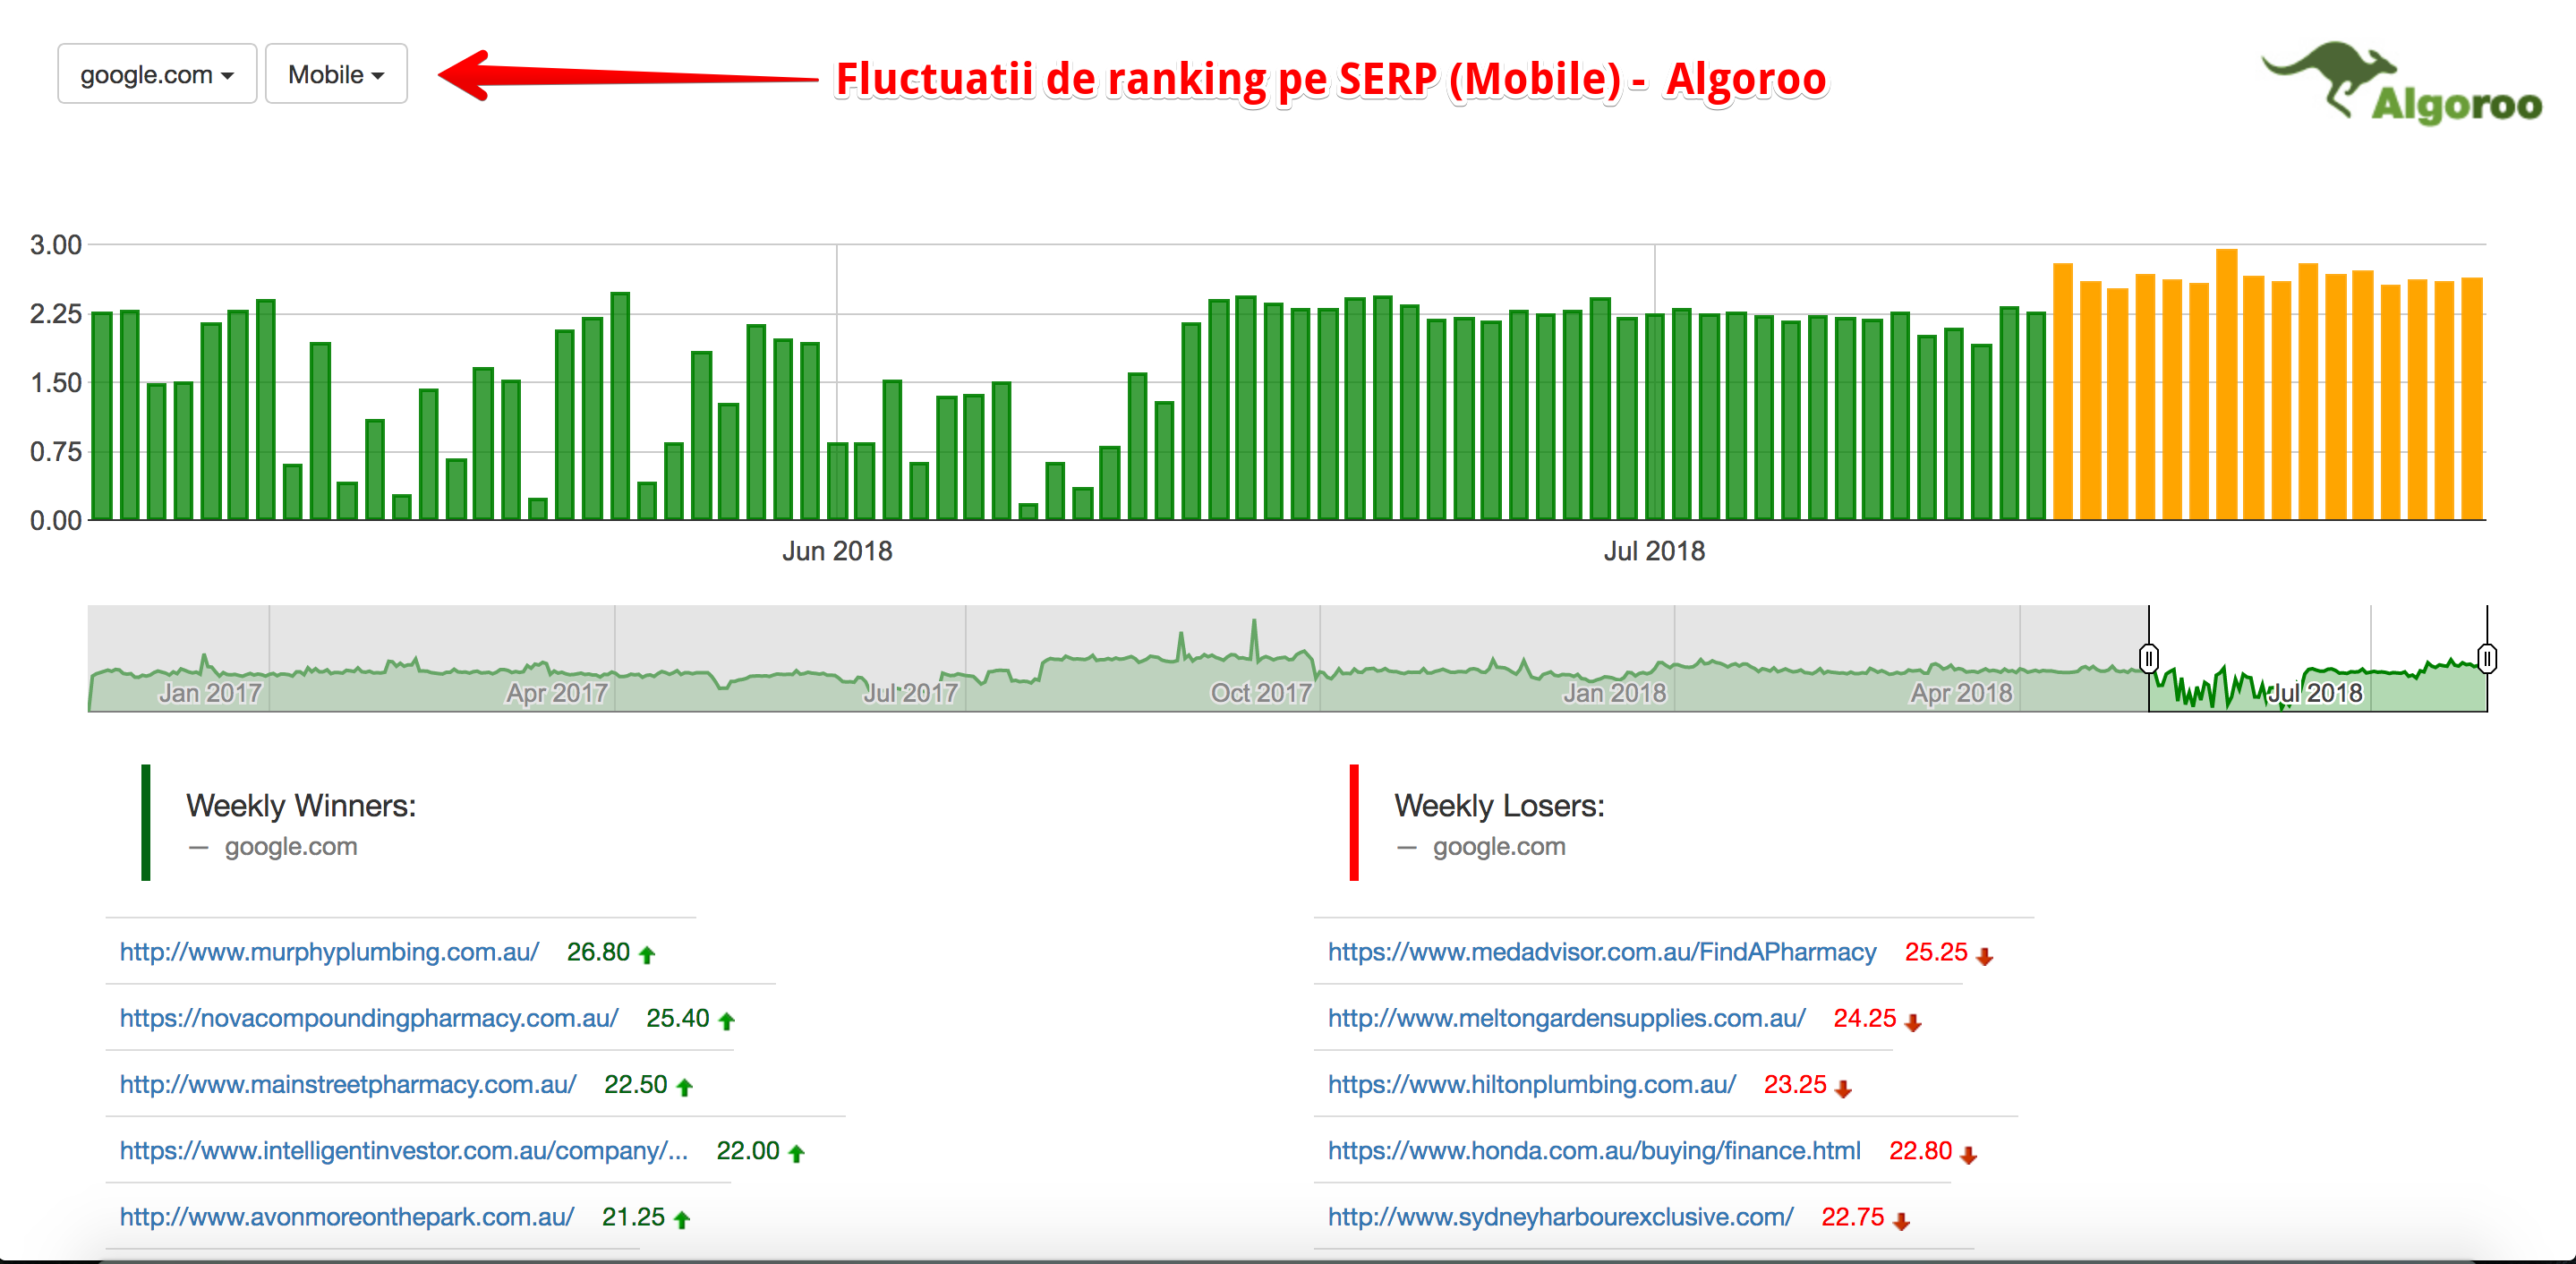 algoroo fluctuatii de ranking seo